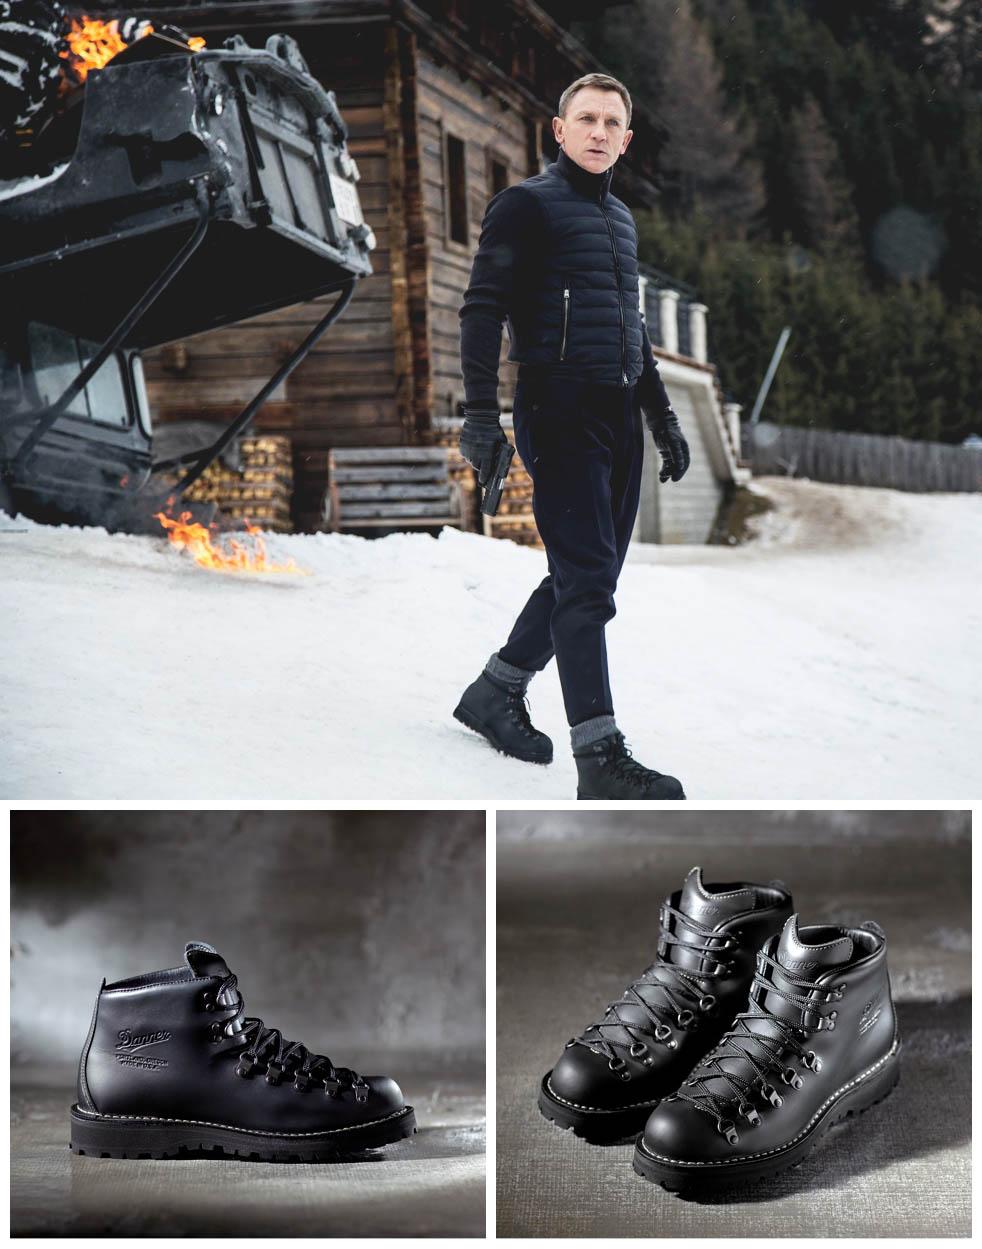 James Bond Boots for Specter by DANNER. #boots #specter #jamesbond #007 #menswear